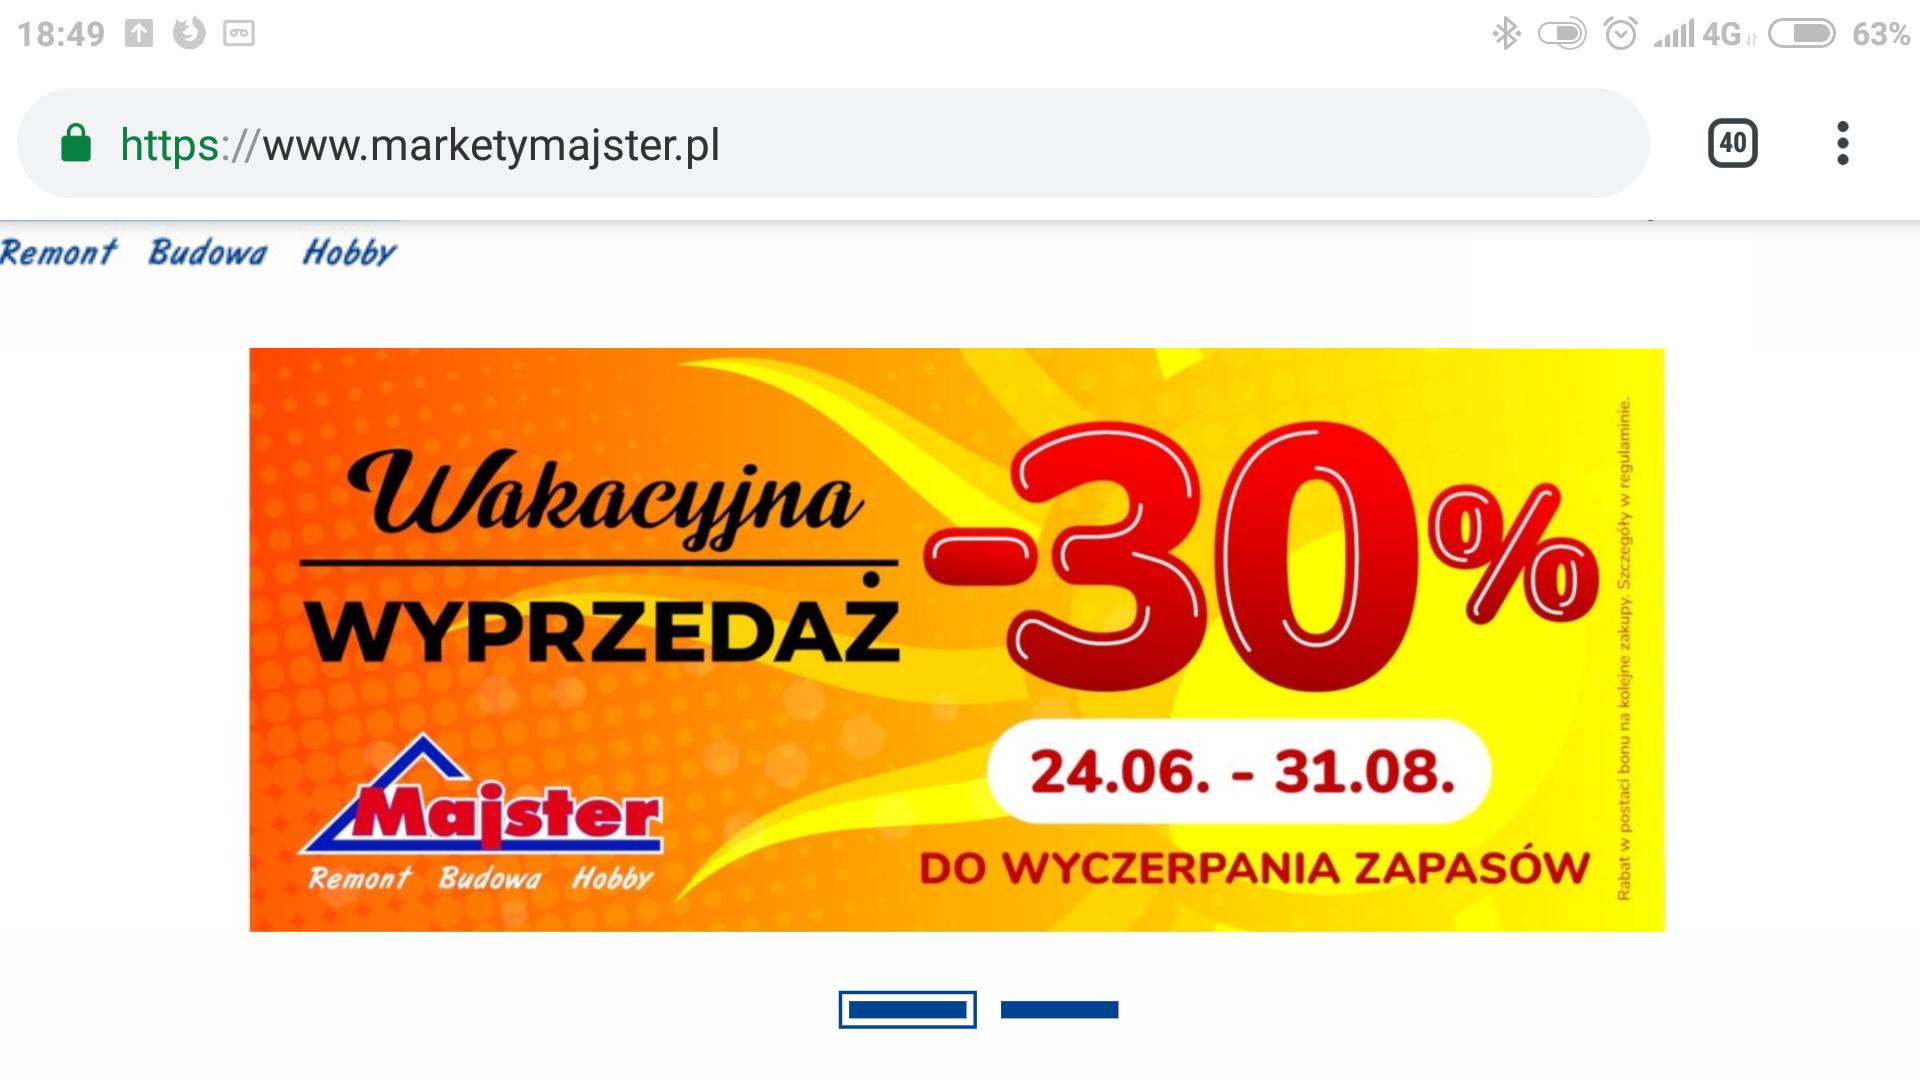 Markety budowlane Majster minus 30% od żółtej ceny